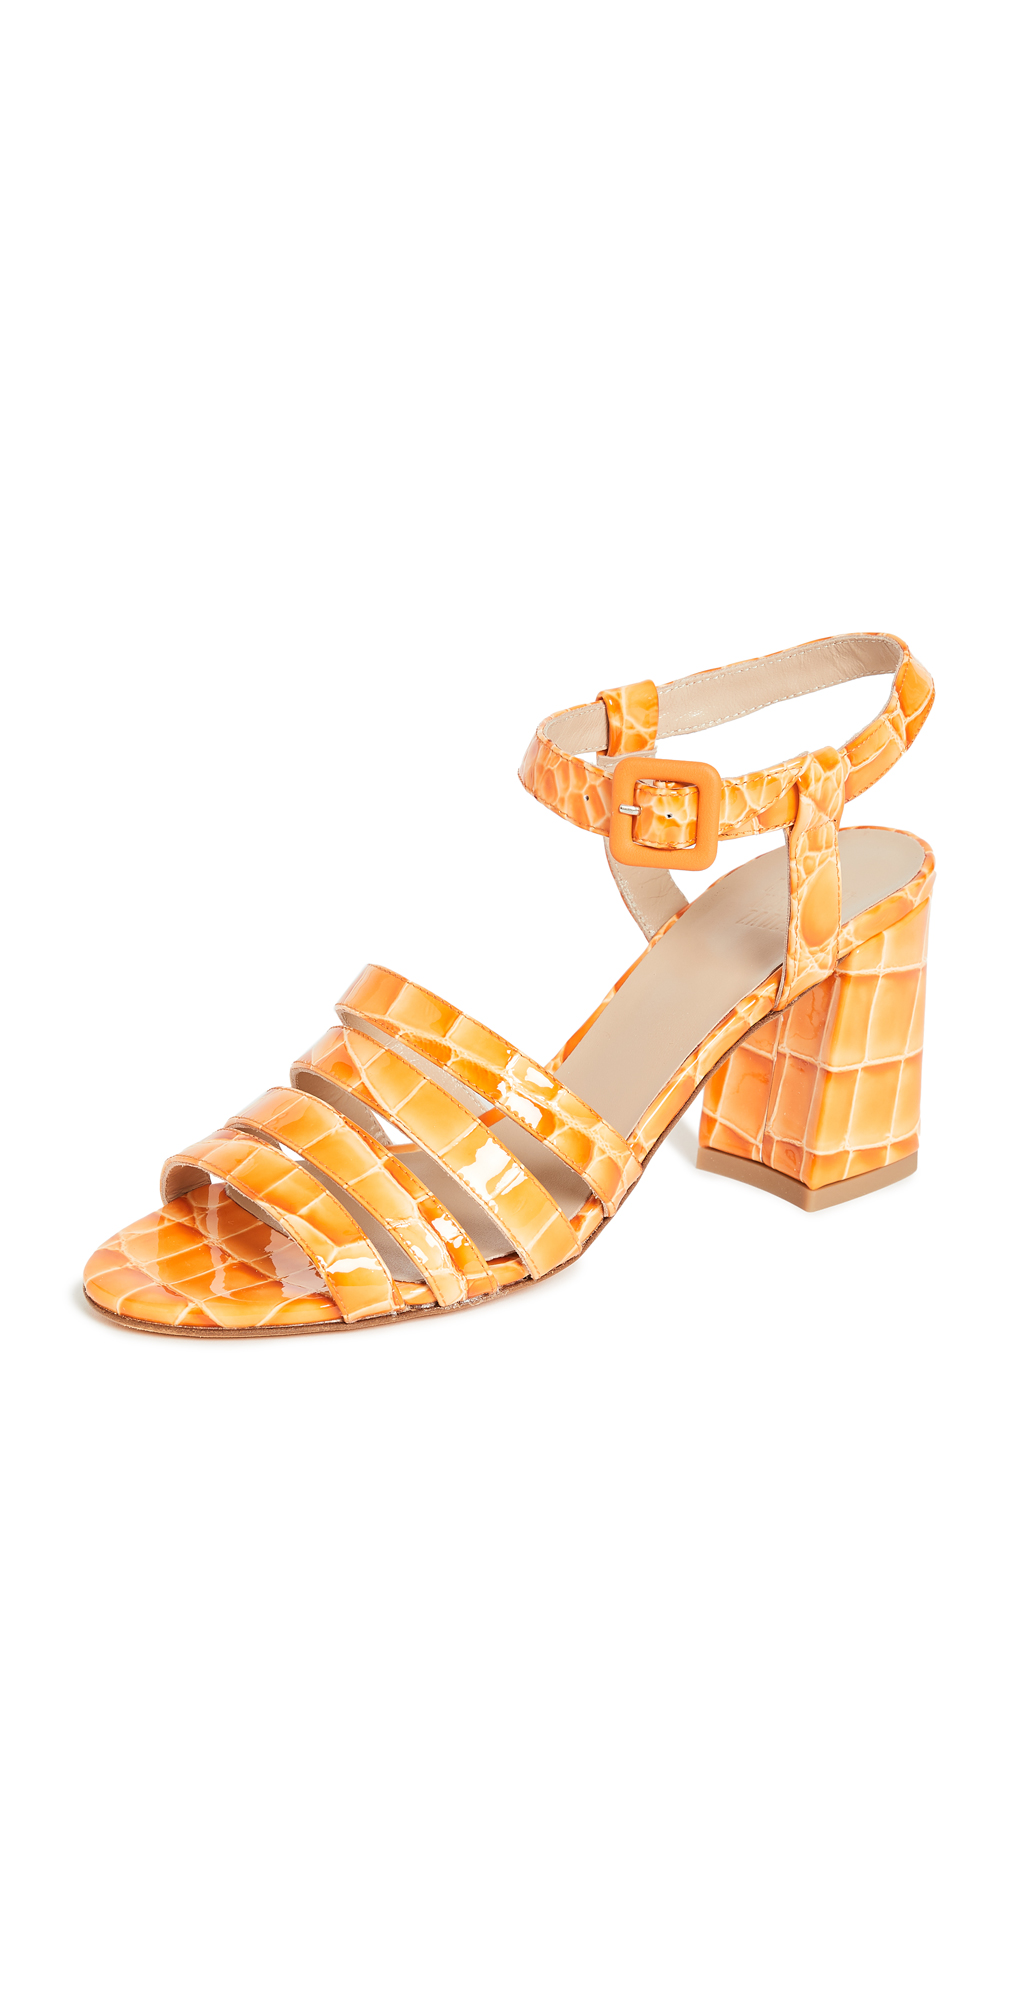 Palma High Sandals